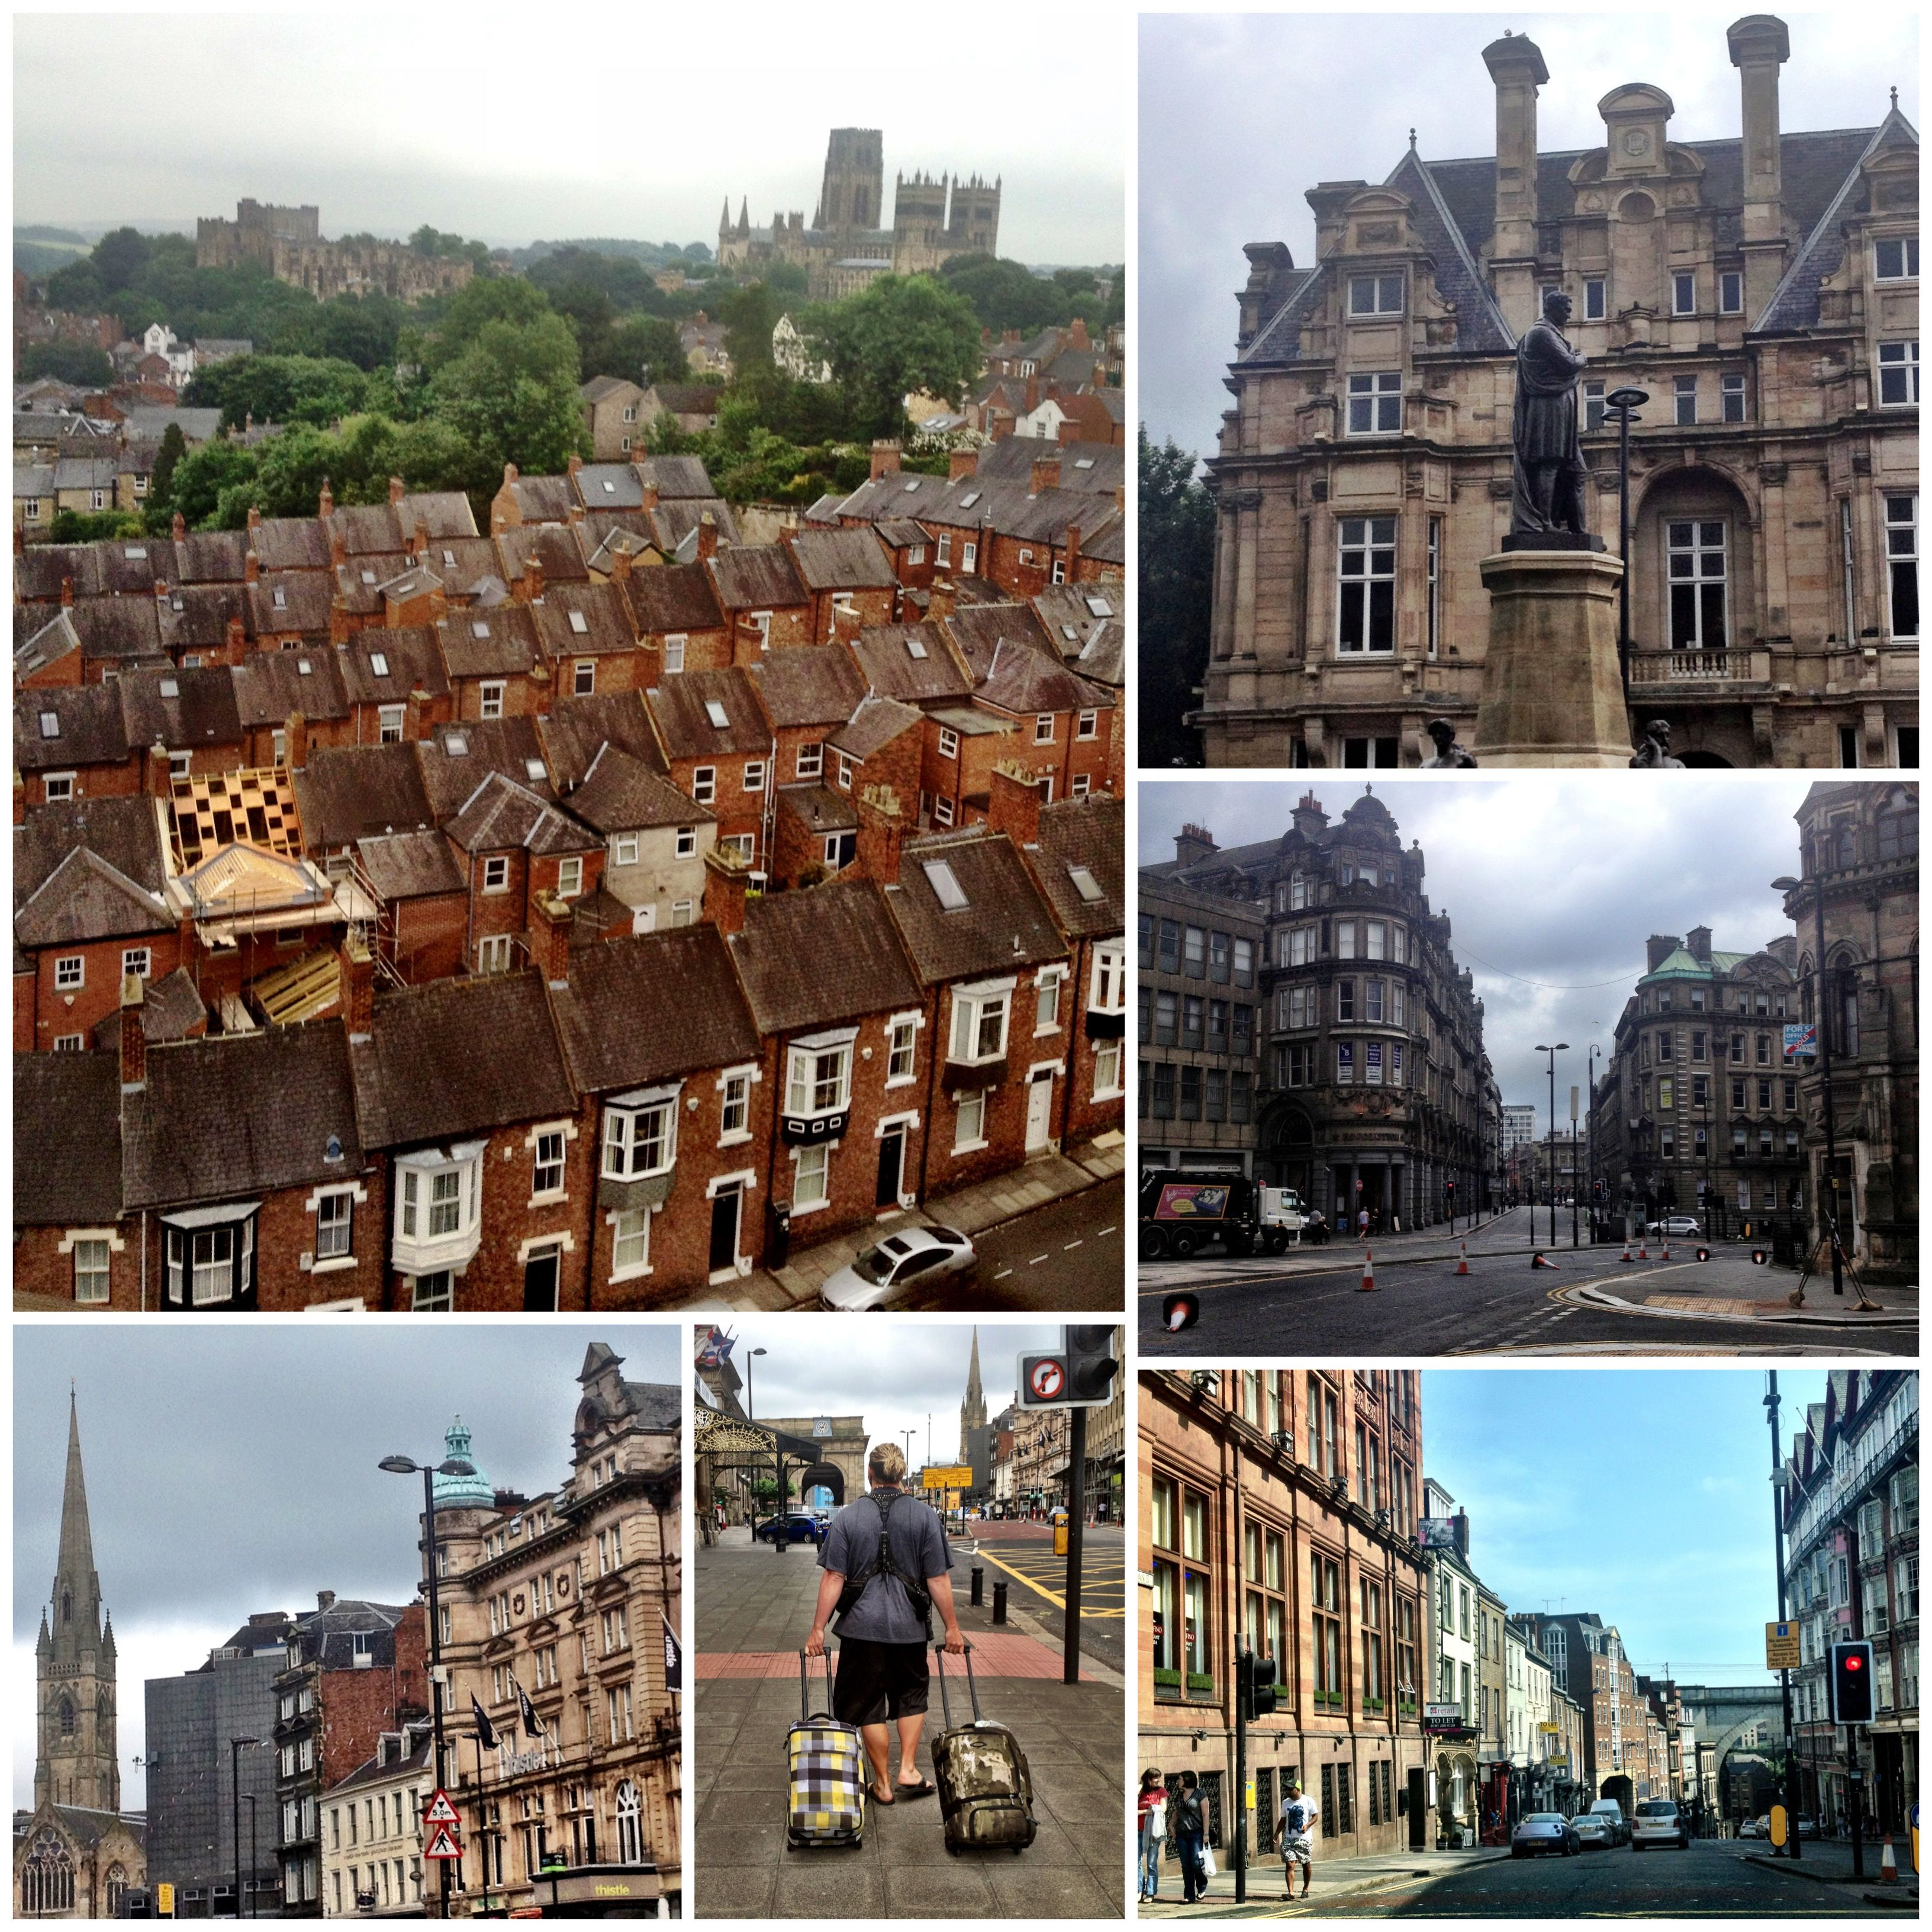 Newcastle, United Kingdom | Photo, Photo wall, The good place